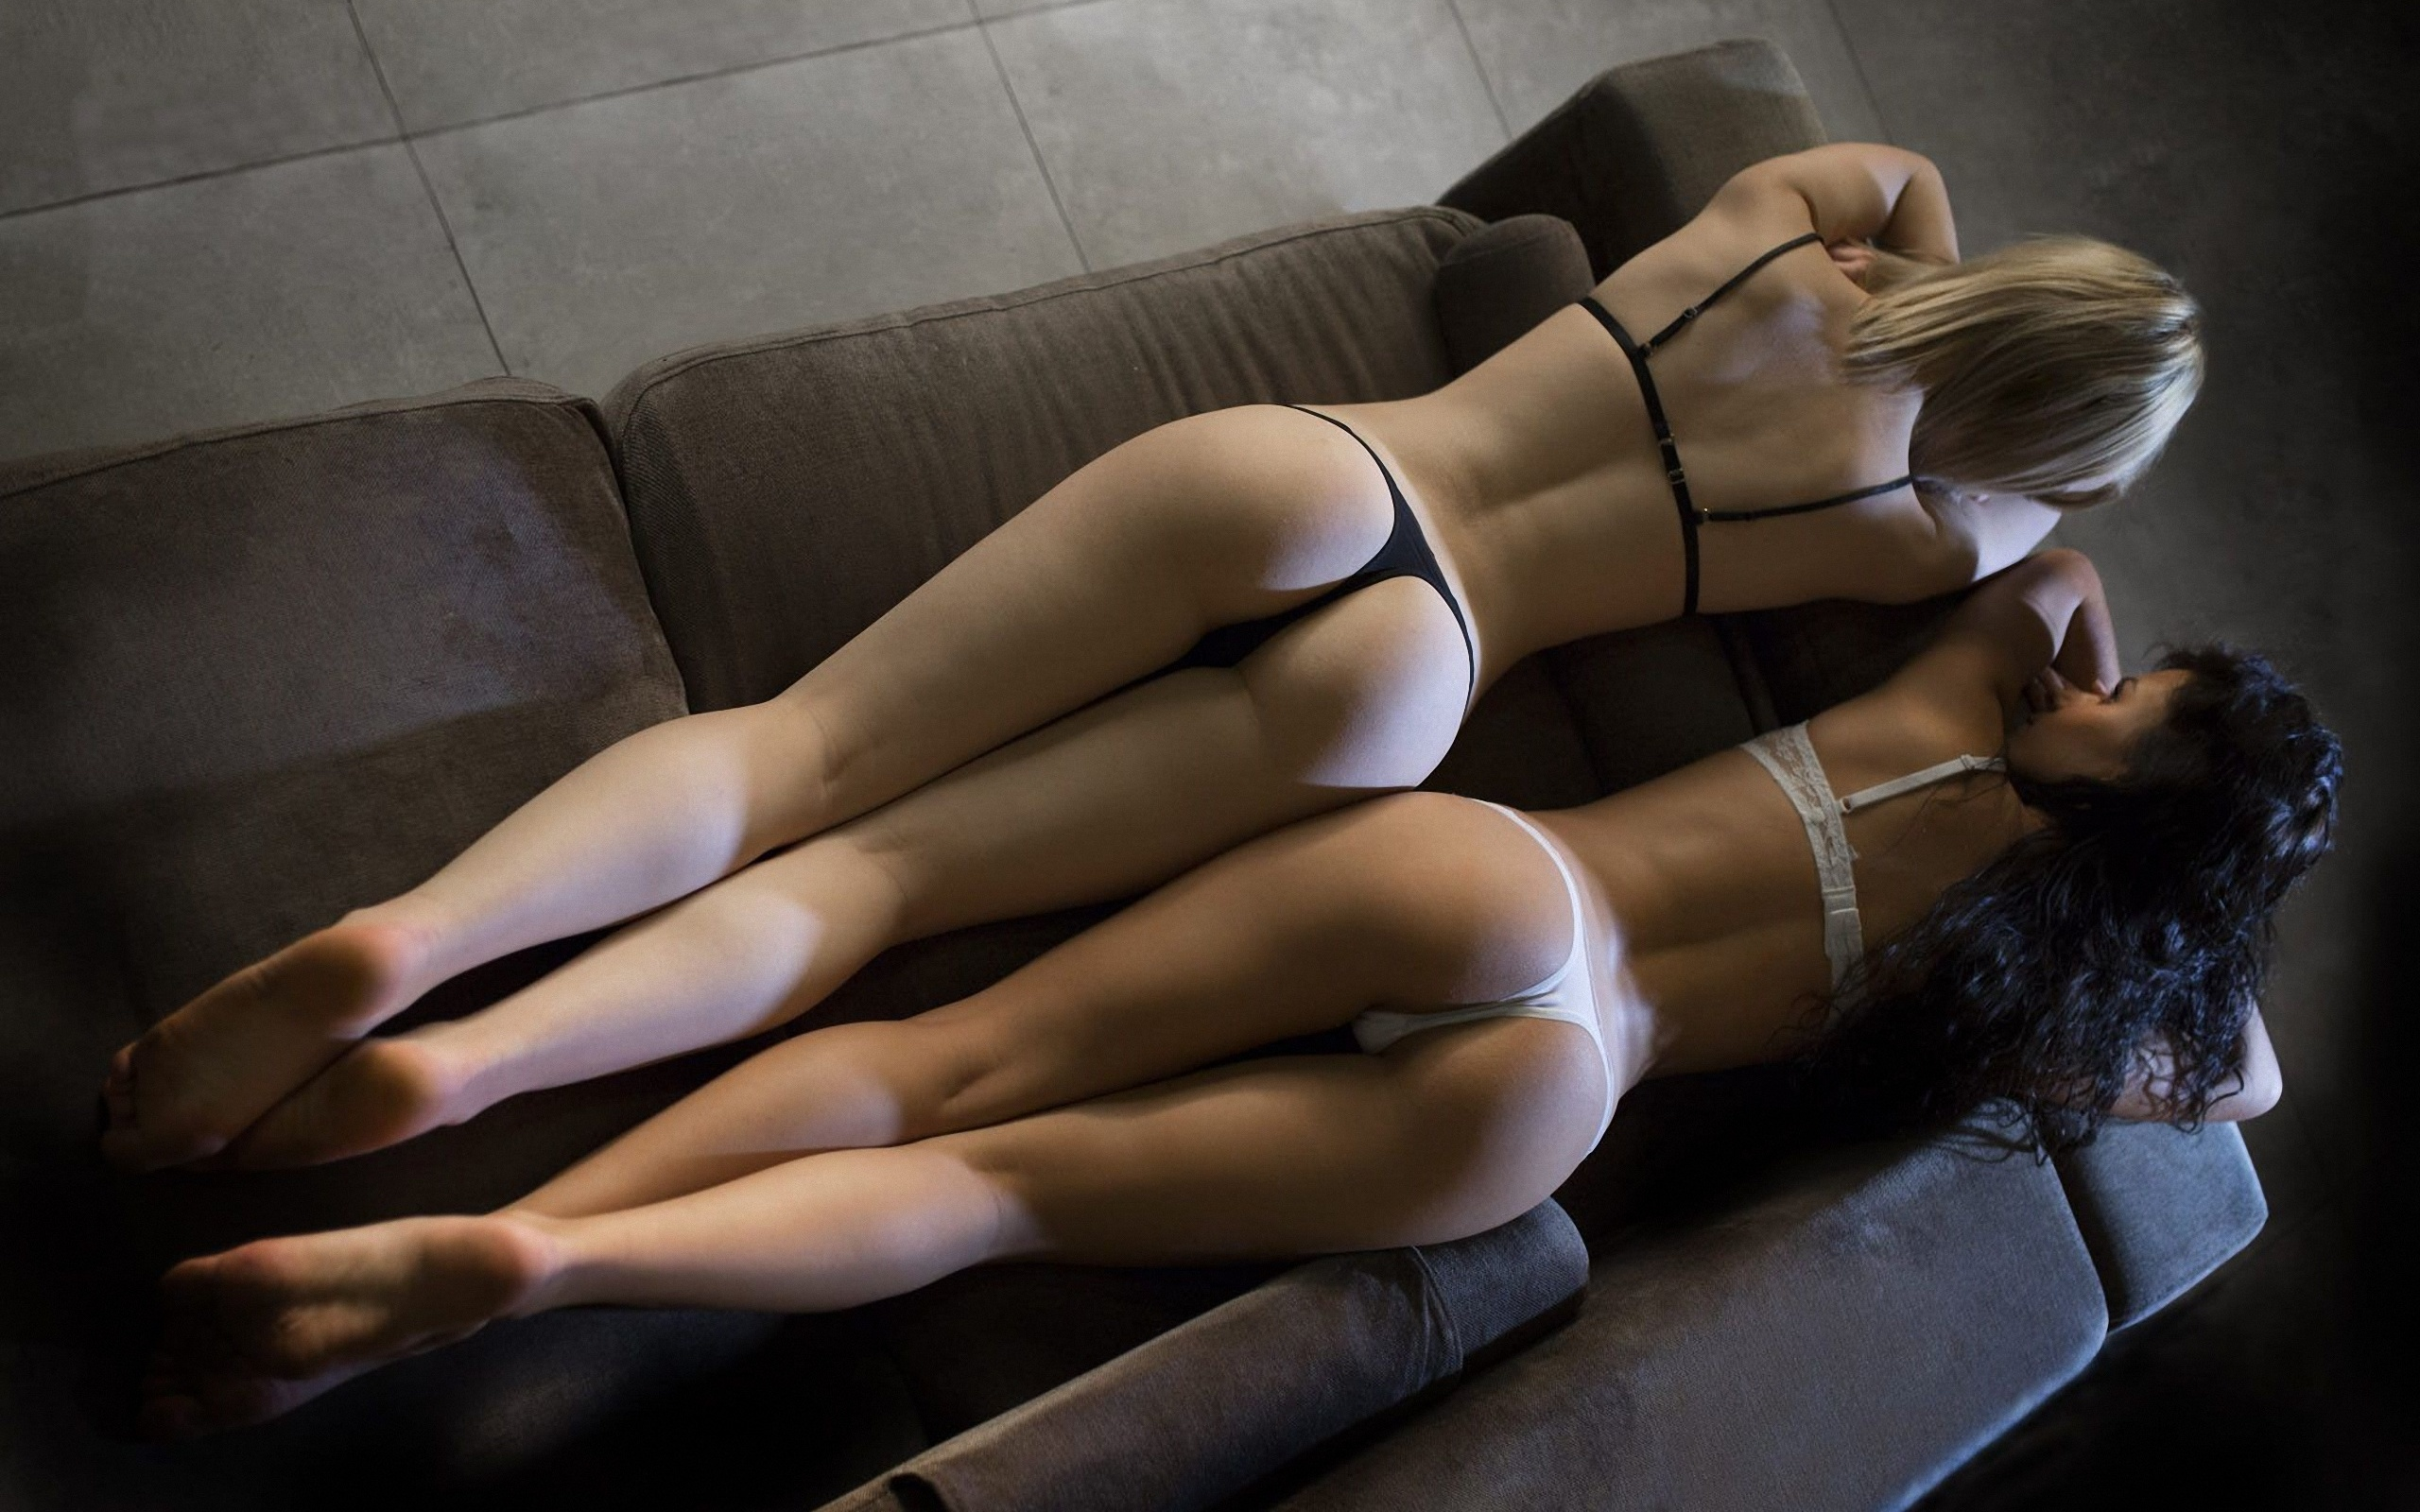 Телочки сверху фото, порно видео молодые врачи